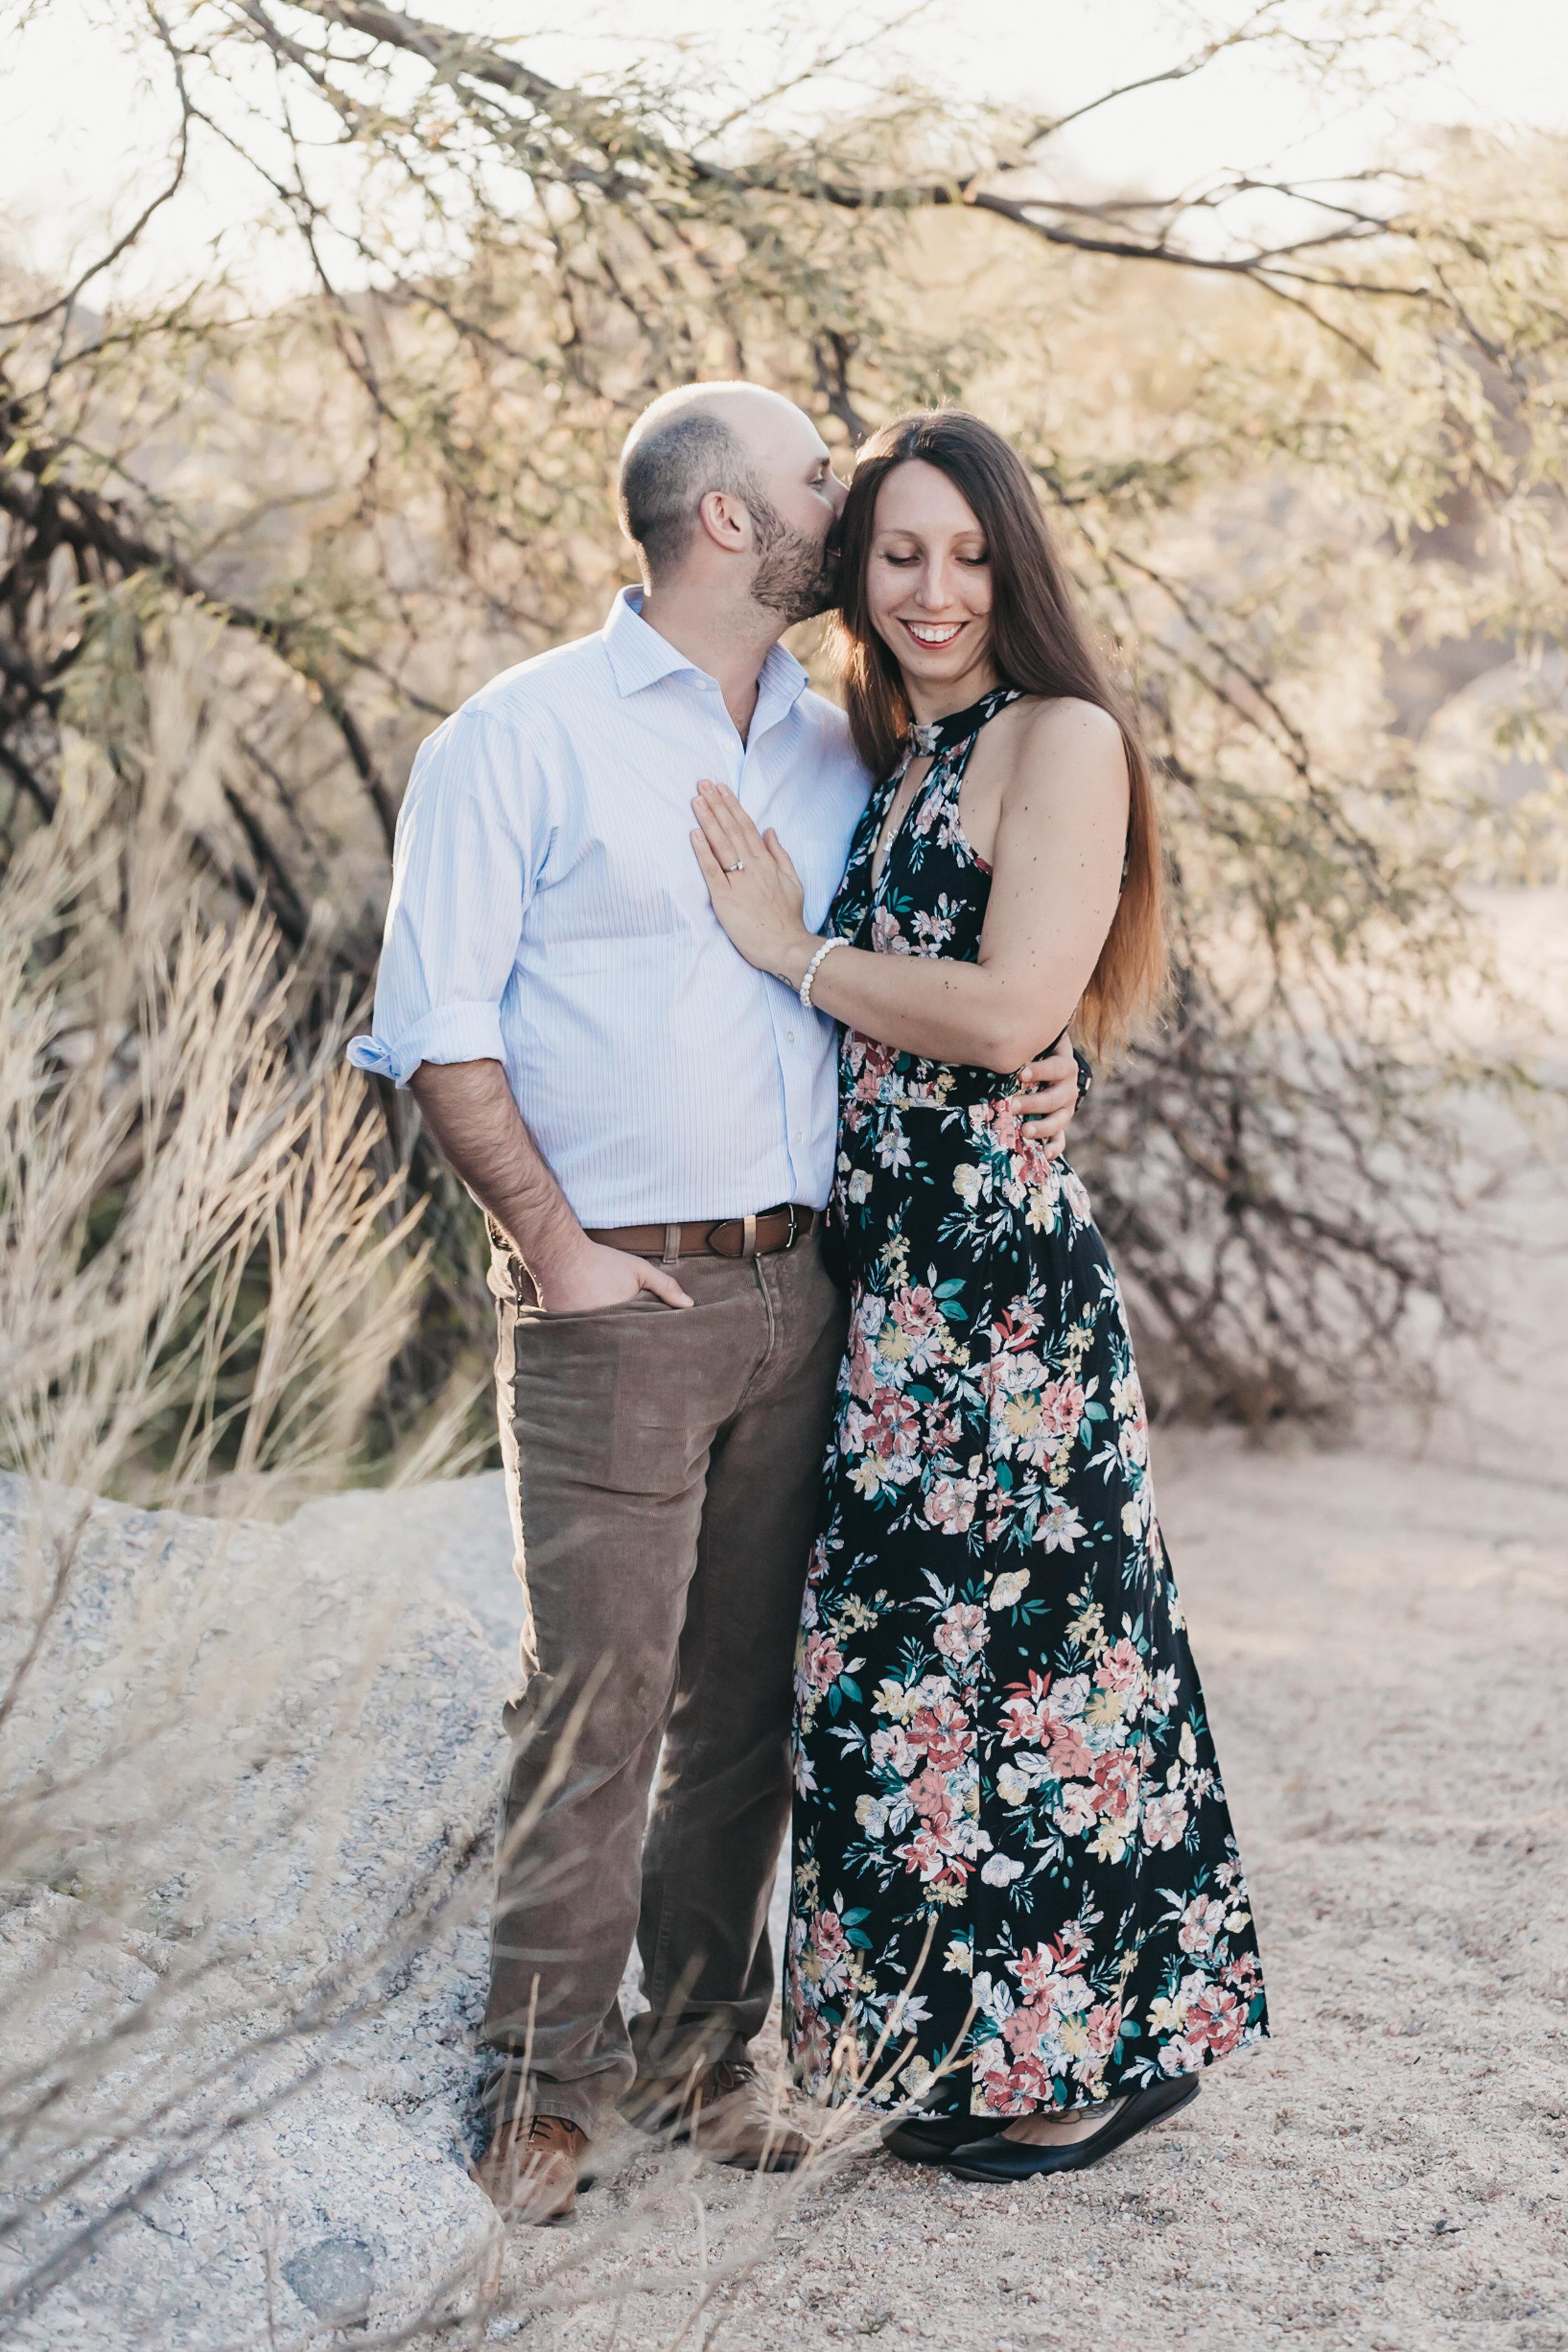 2018 Giordano Engagement Blog-1-2.jpg